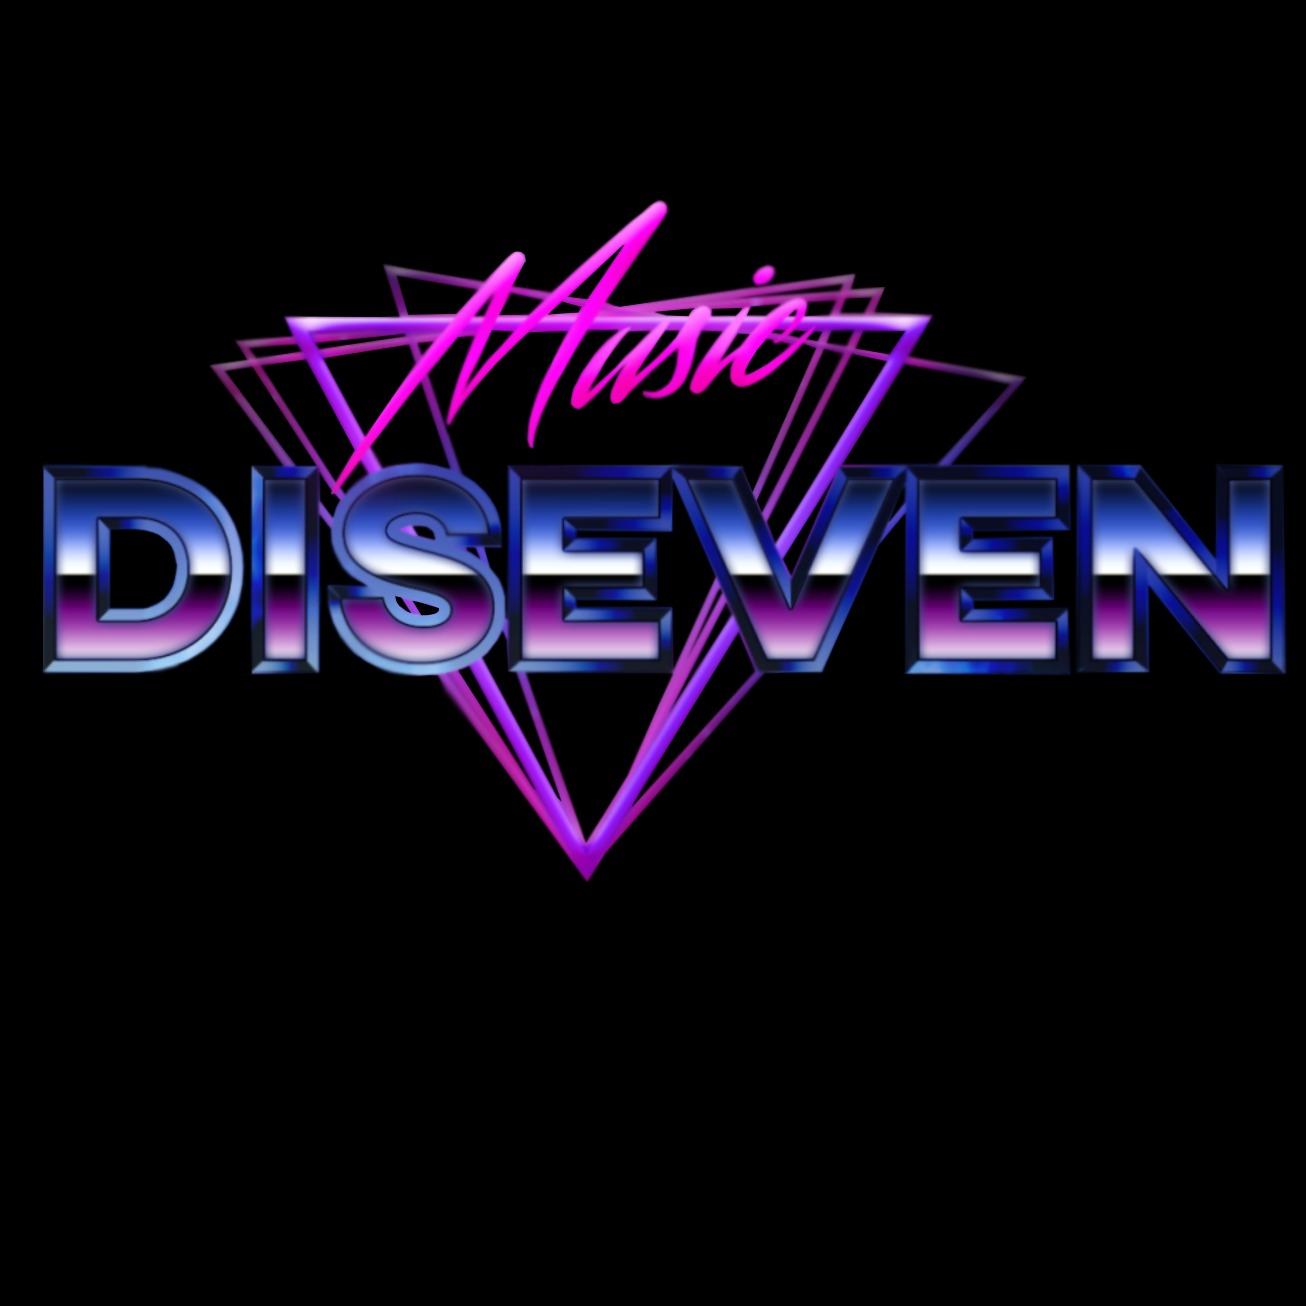 DISEVEN MUSIC